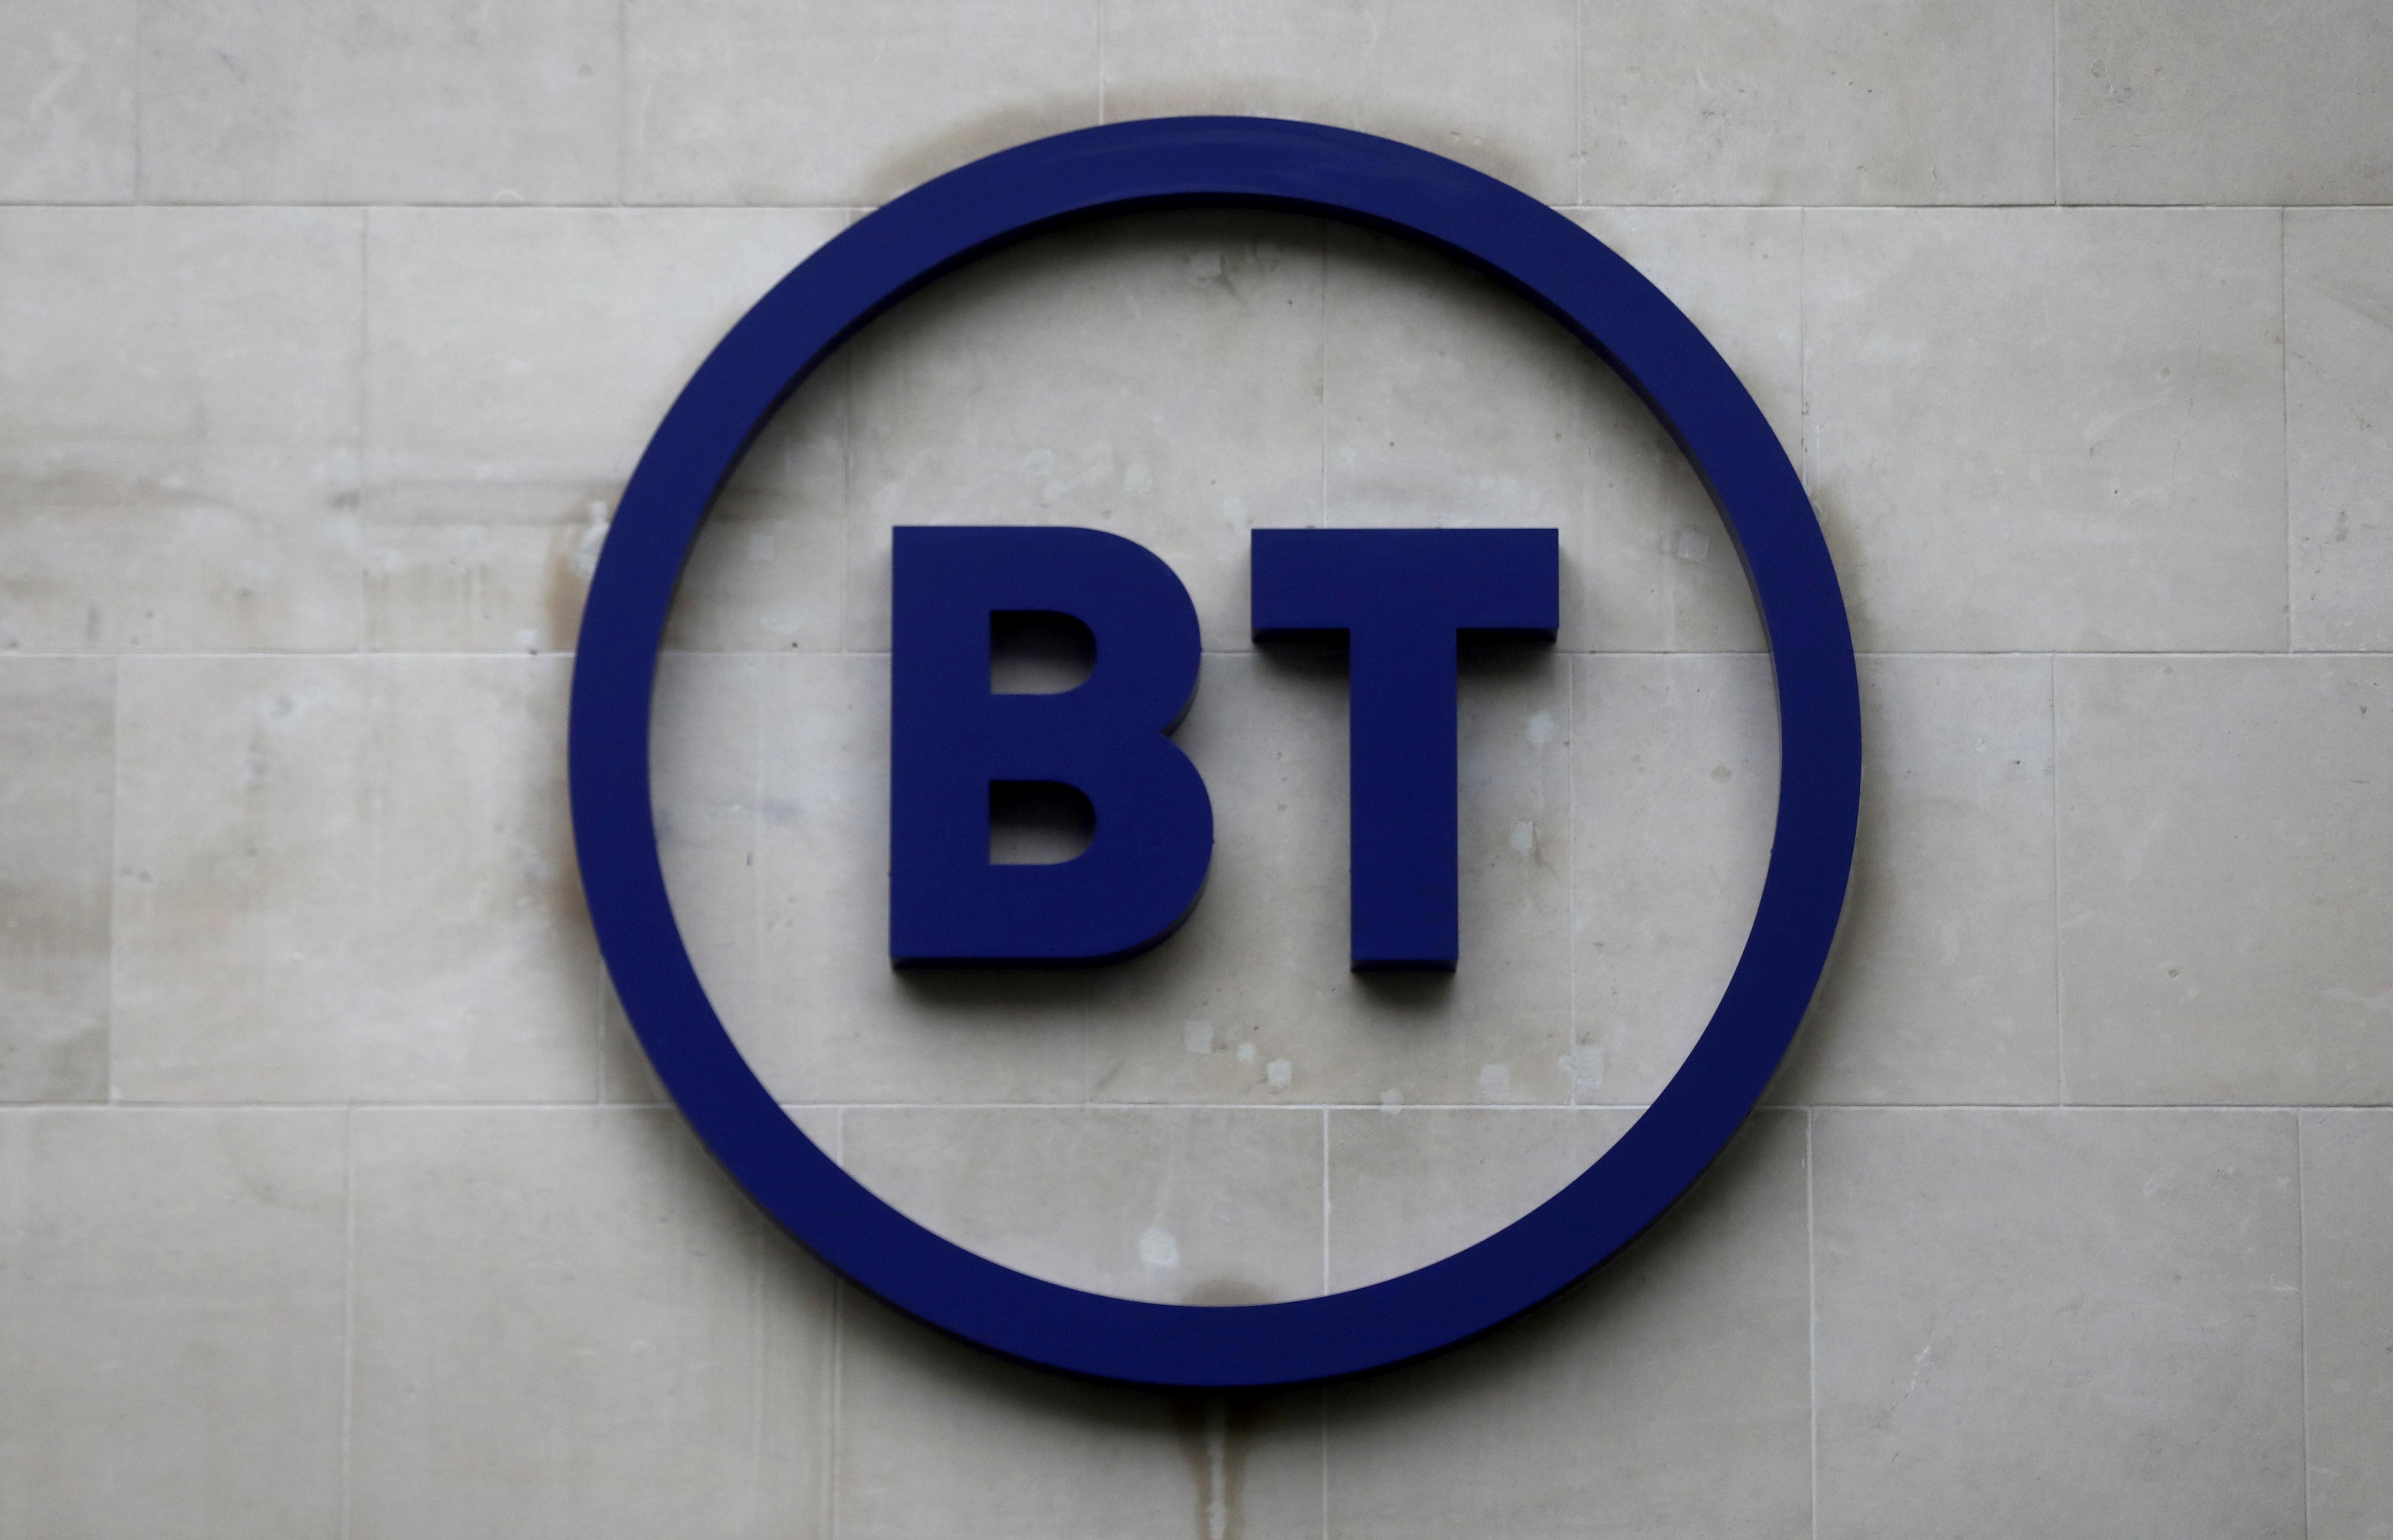 Company's logo is displayed at British Telecom (BT) headquarters in London, Britain, November 15, 2019. REUTERS/Simon Dawson//File Photo